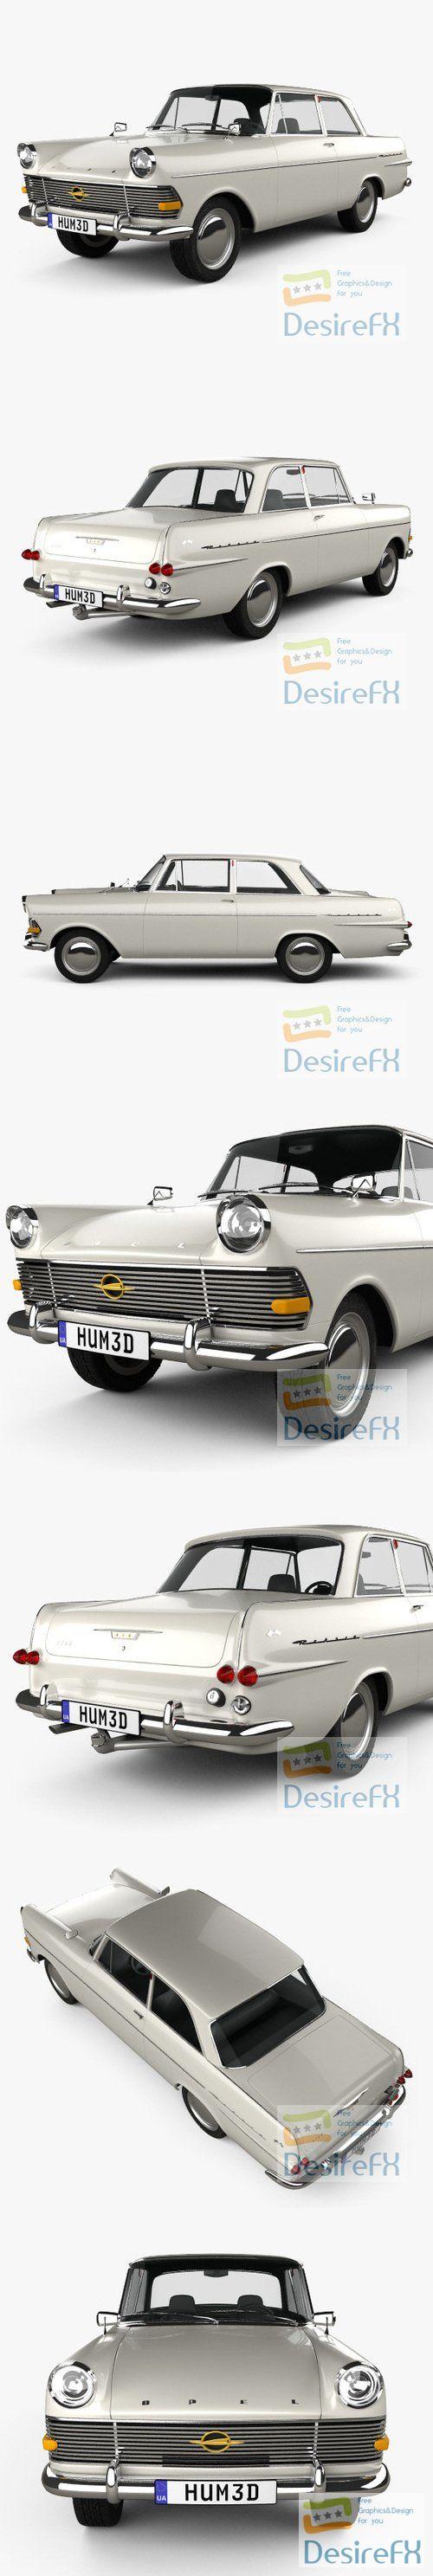 Opel Rekord 2-door sedan 1960 3D Model